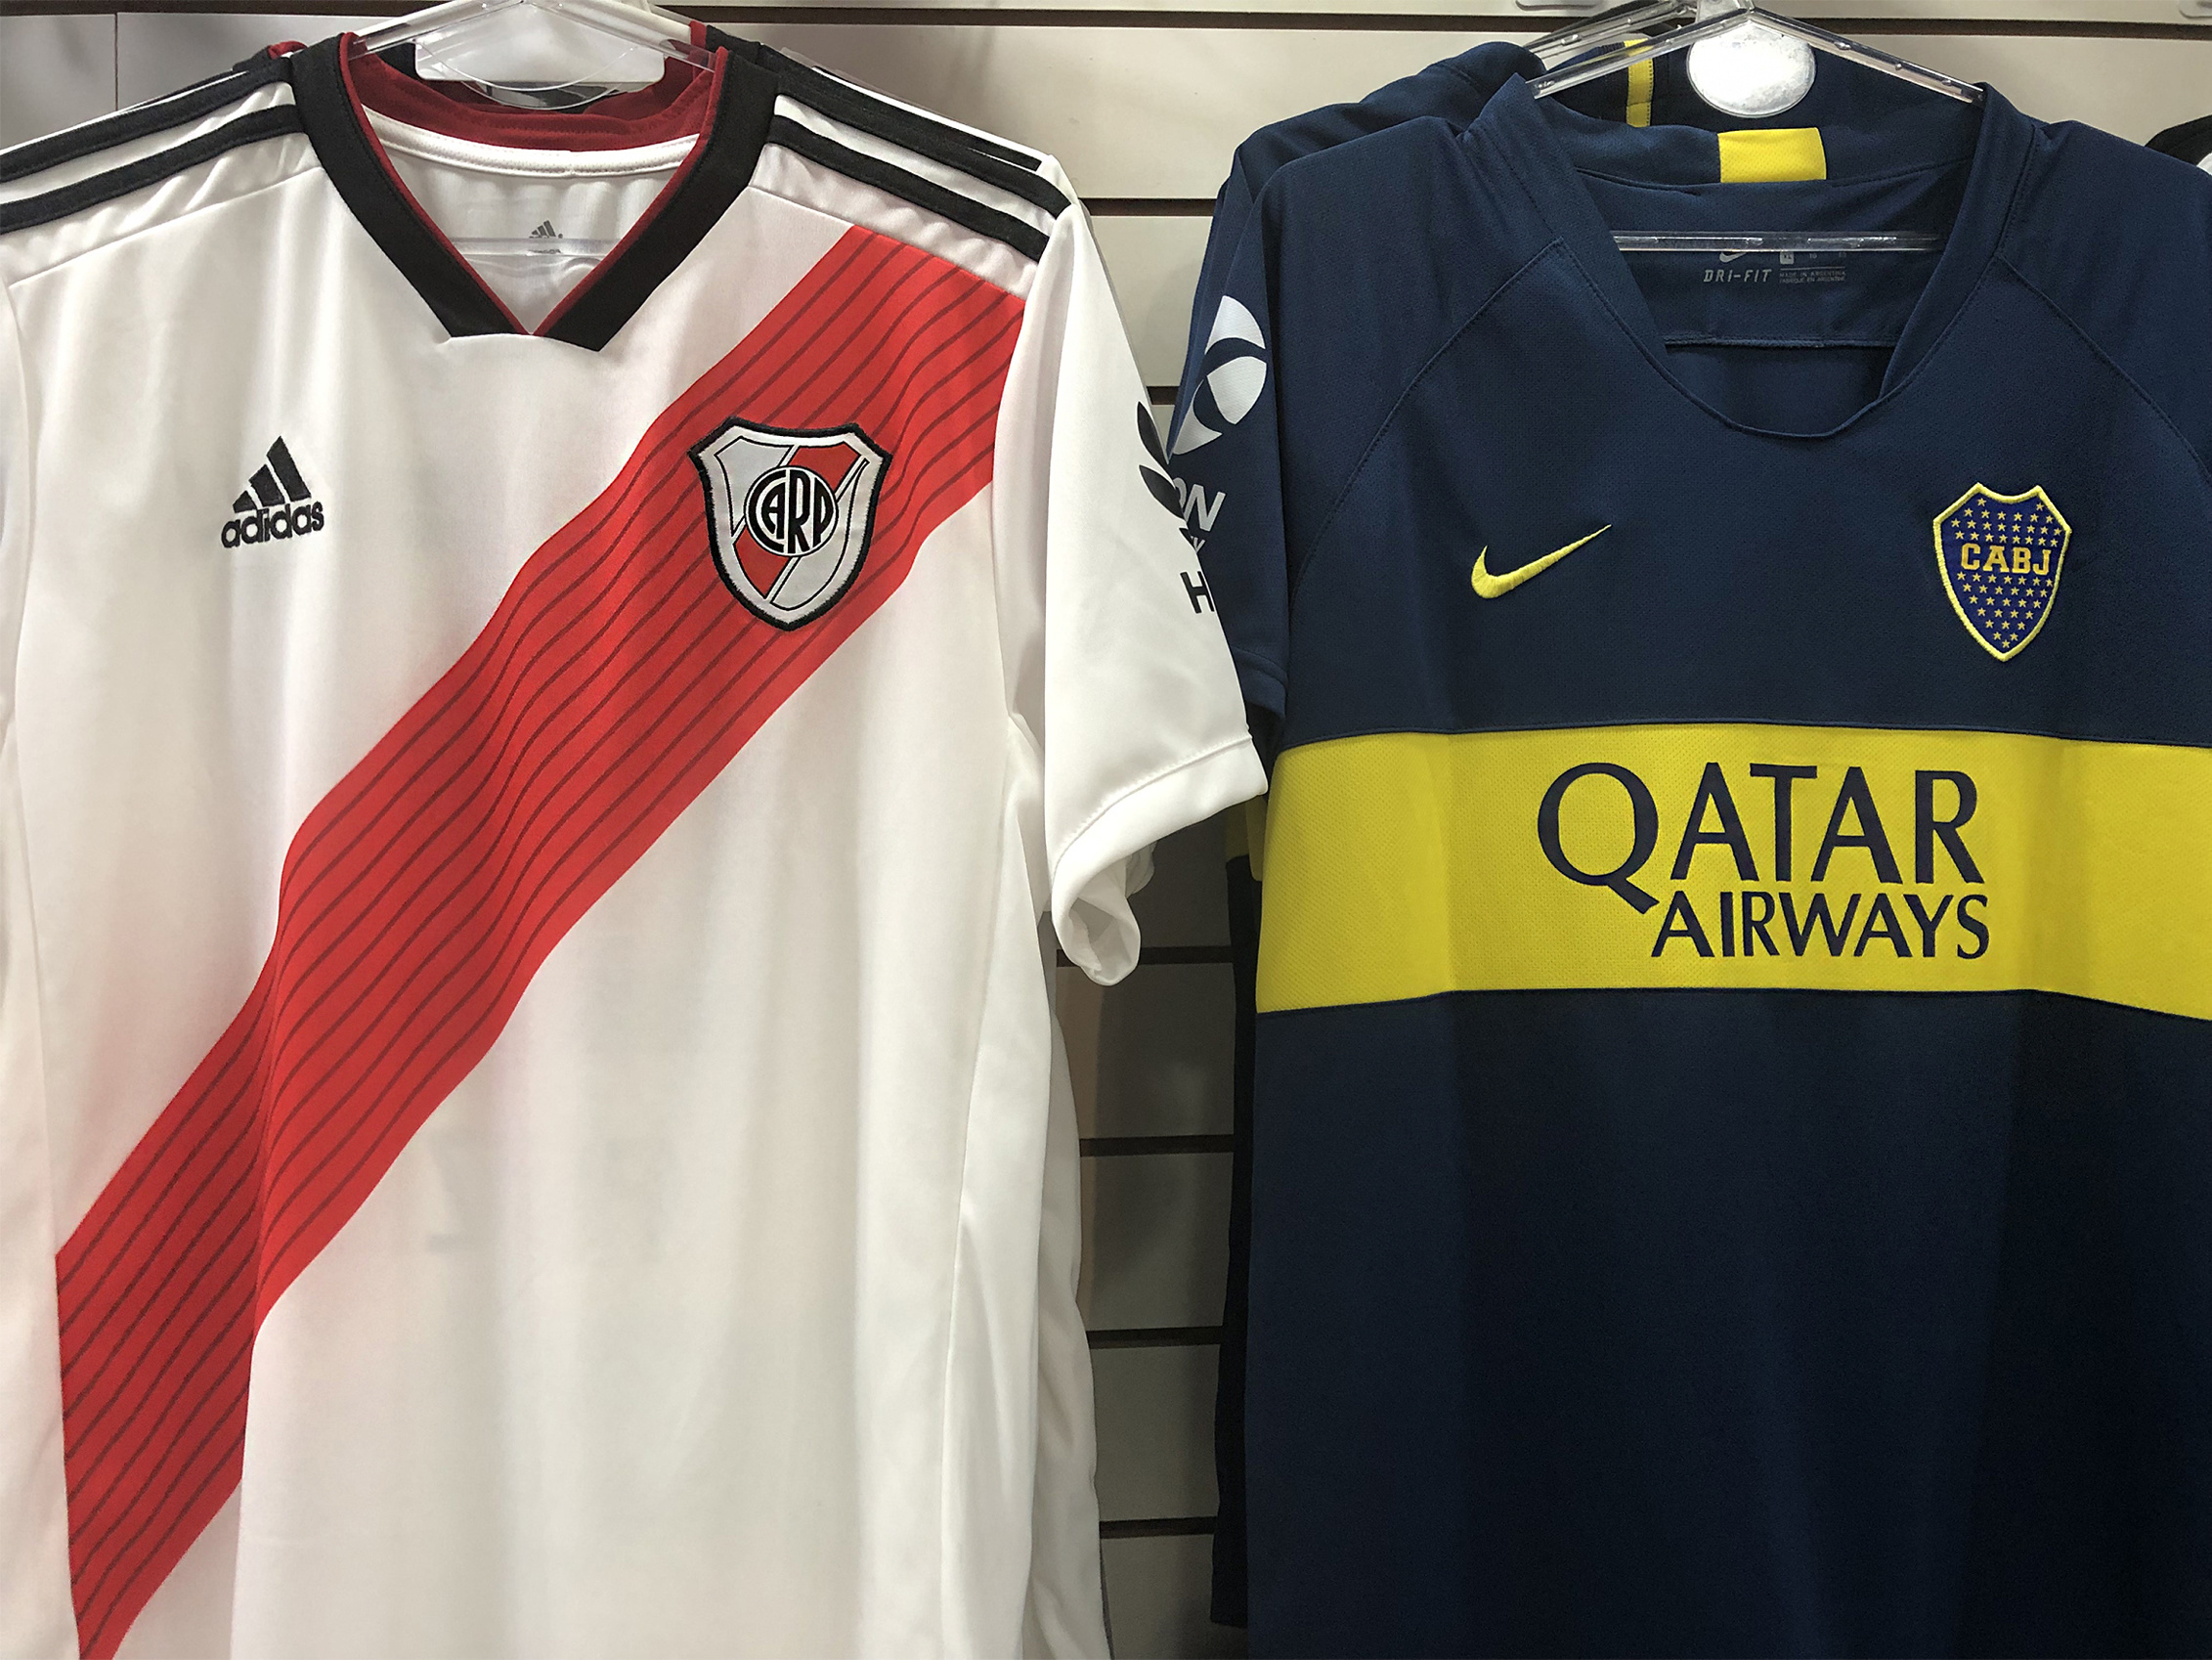 Postergan final de Libertadores entre Boca y River por agresión a jugadores